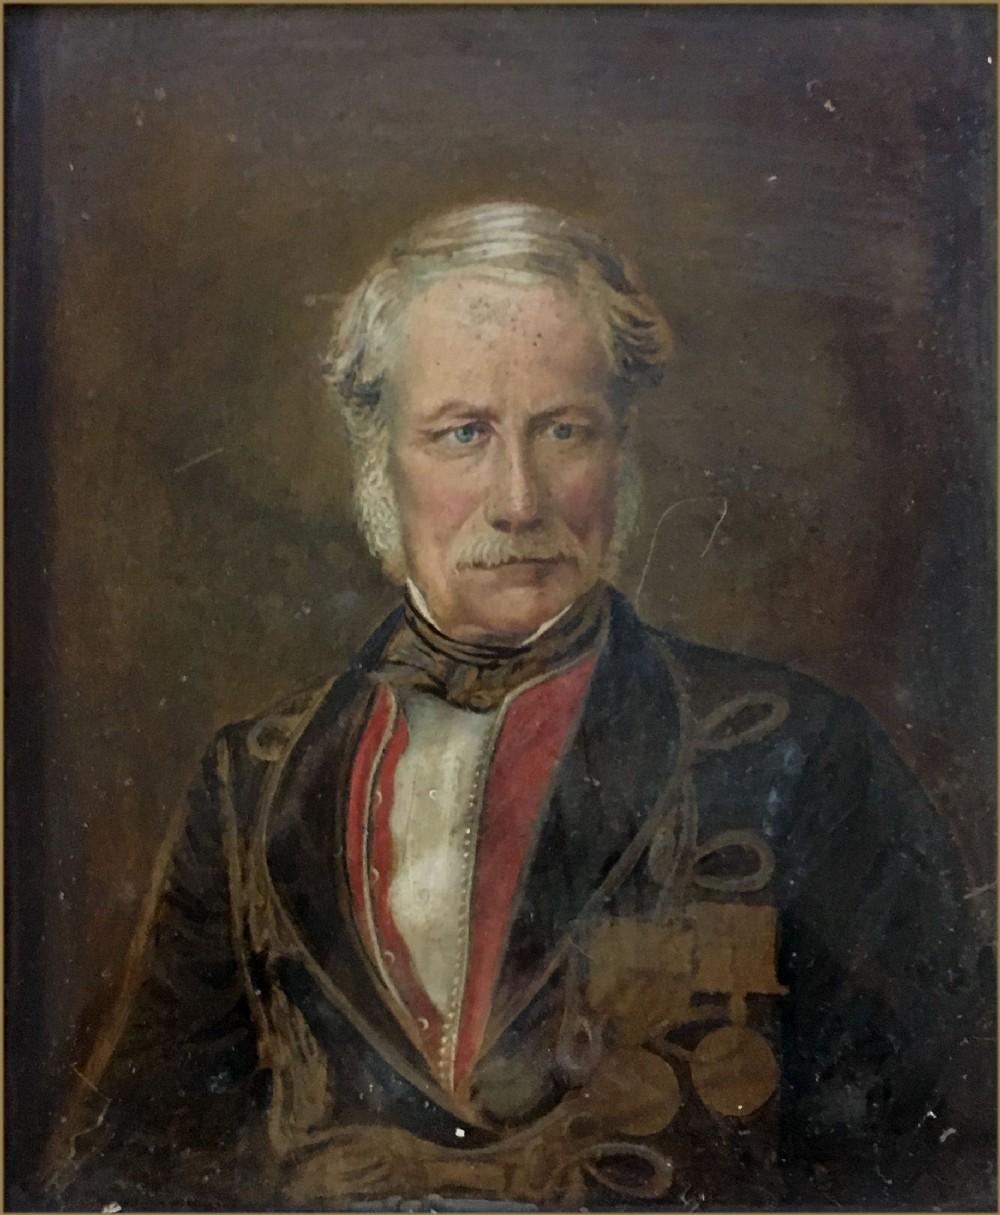 john irvine 18051888portrait of sir john larkin cheese richardson 18101878 in military dress